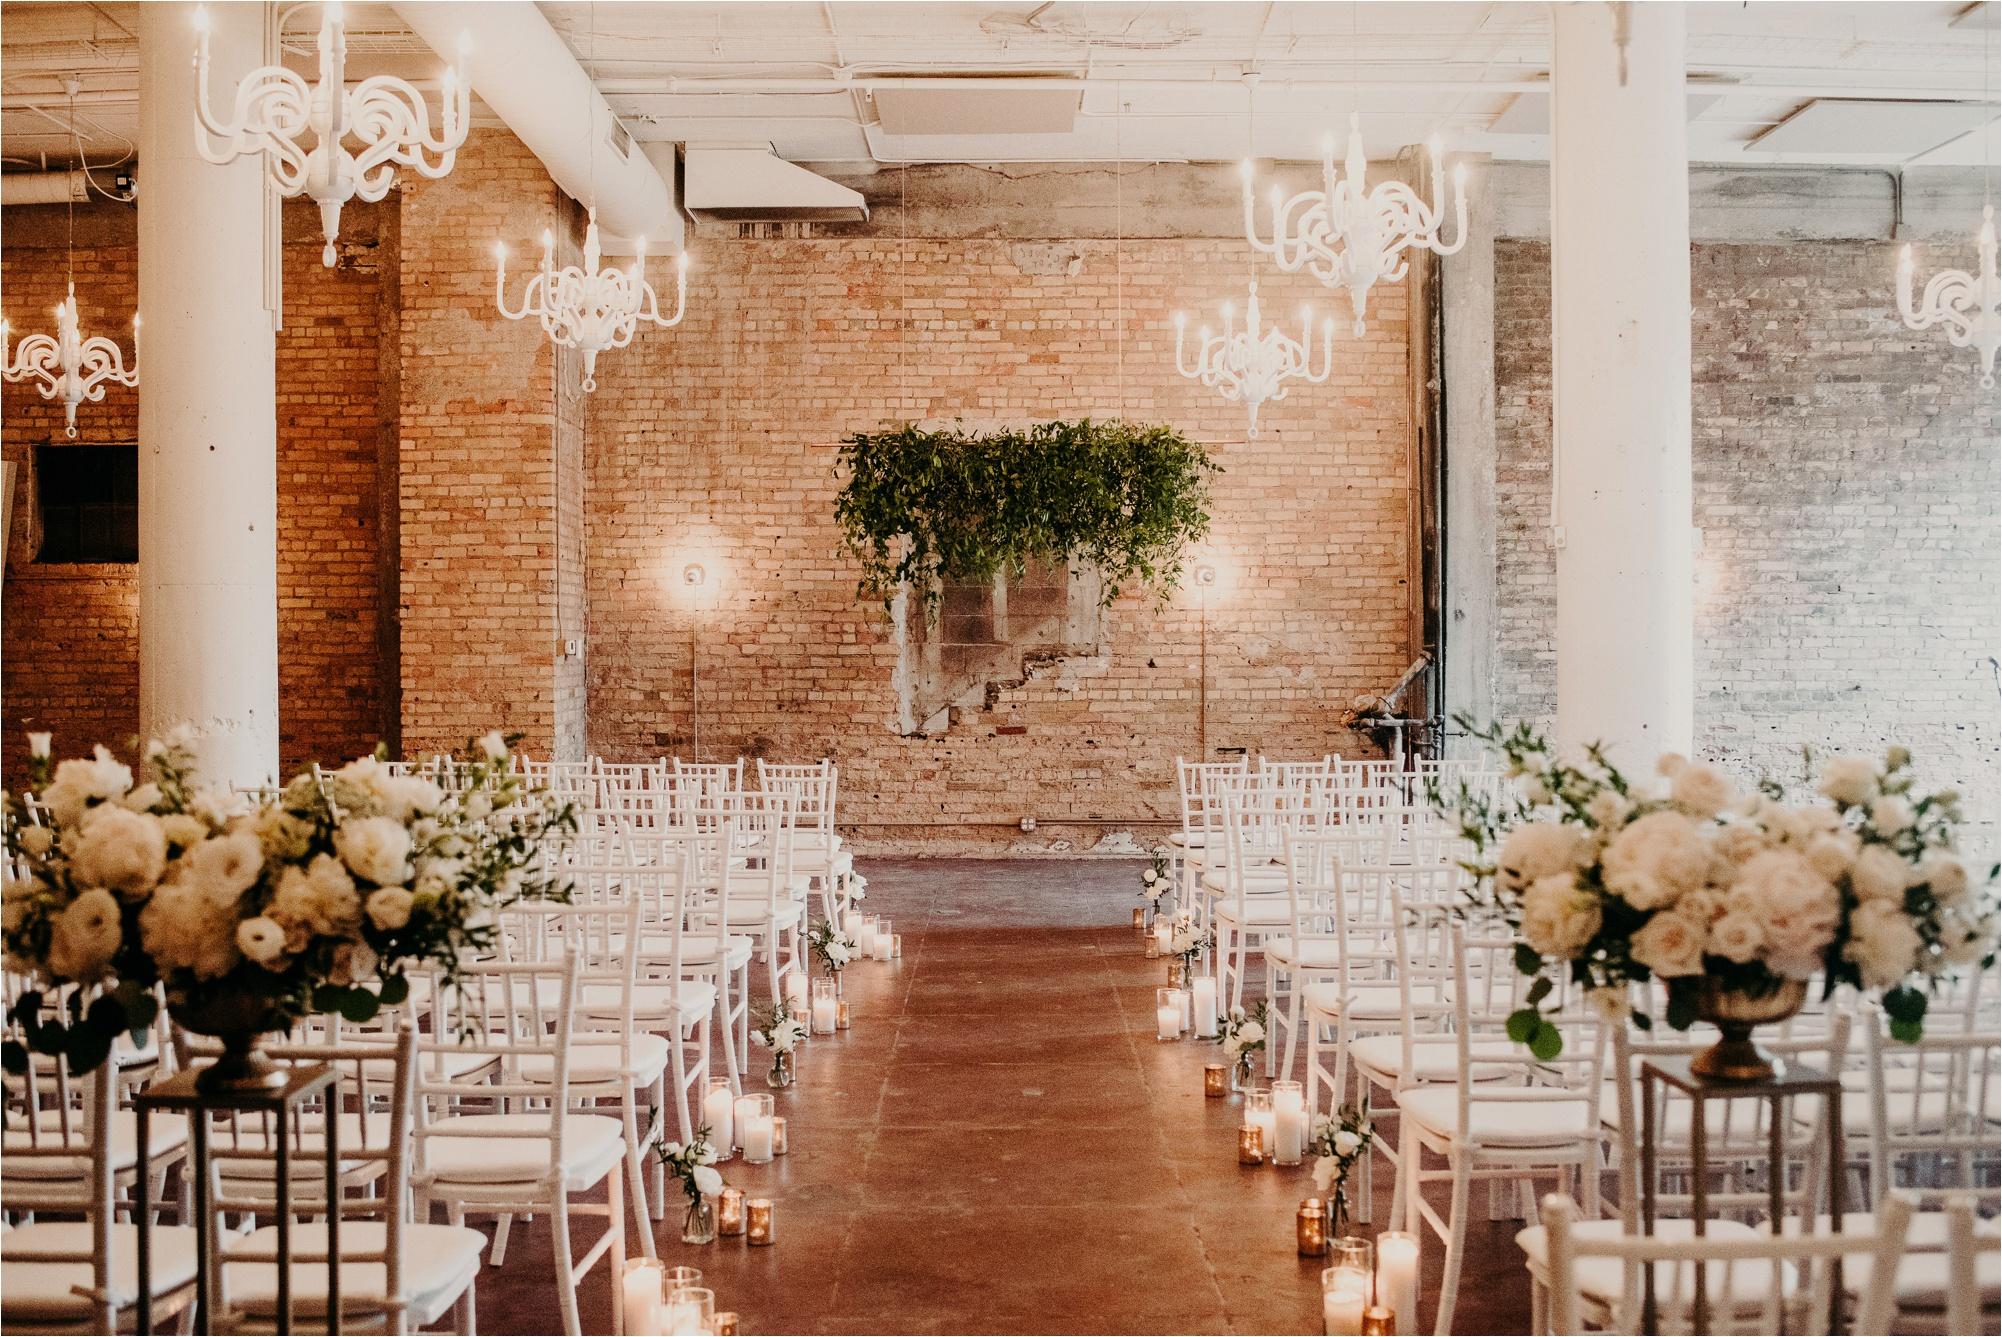 loring social minneapolis wedding ceremony space pristine floral